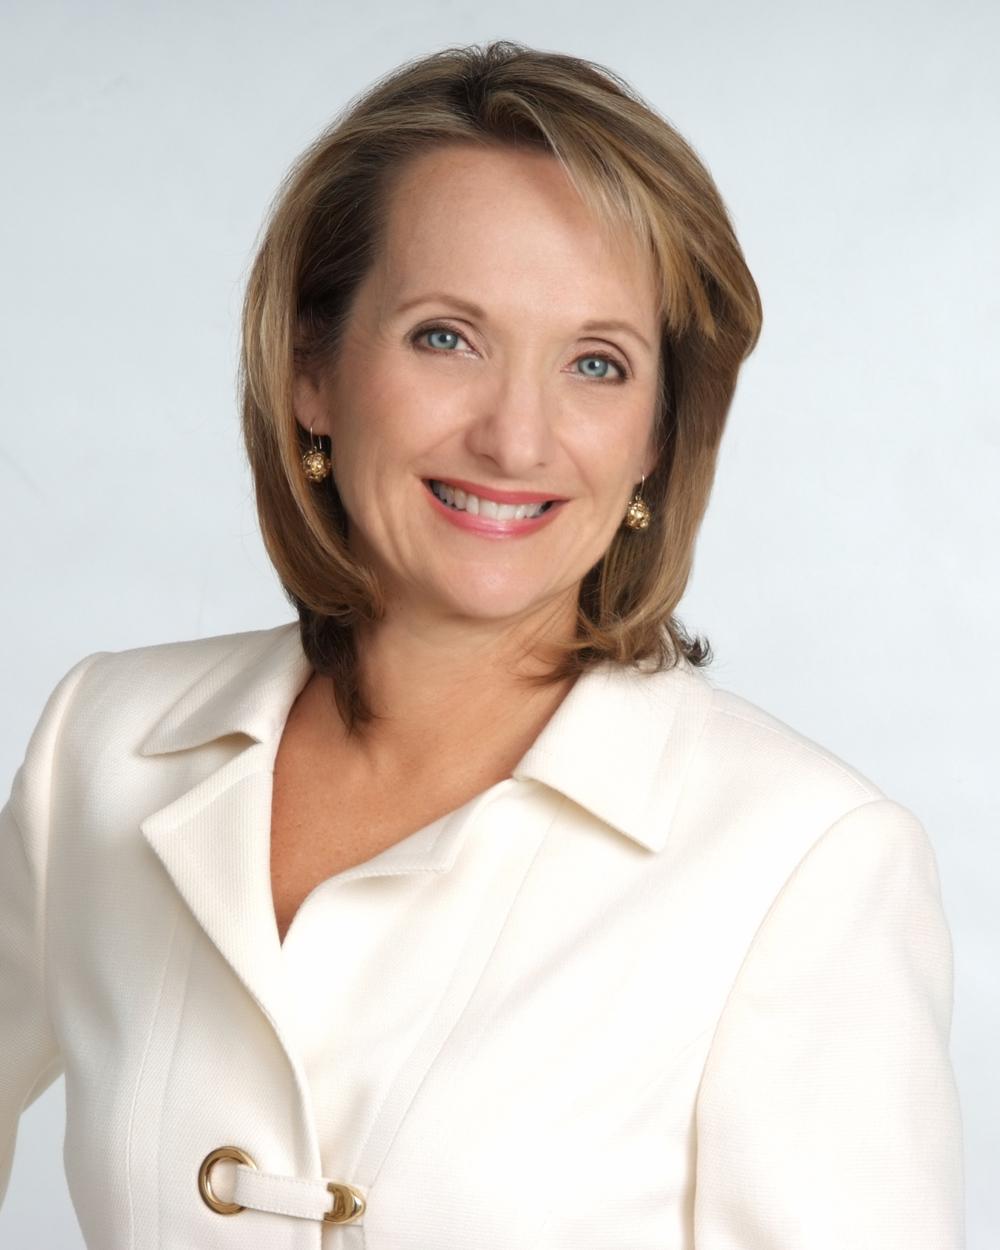 Linda Lattimore CSI Founder, Attorney, Social Entrepreneur